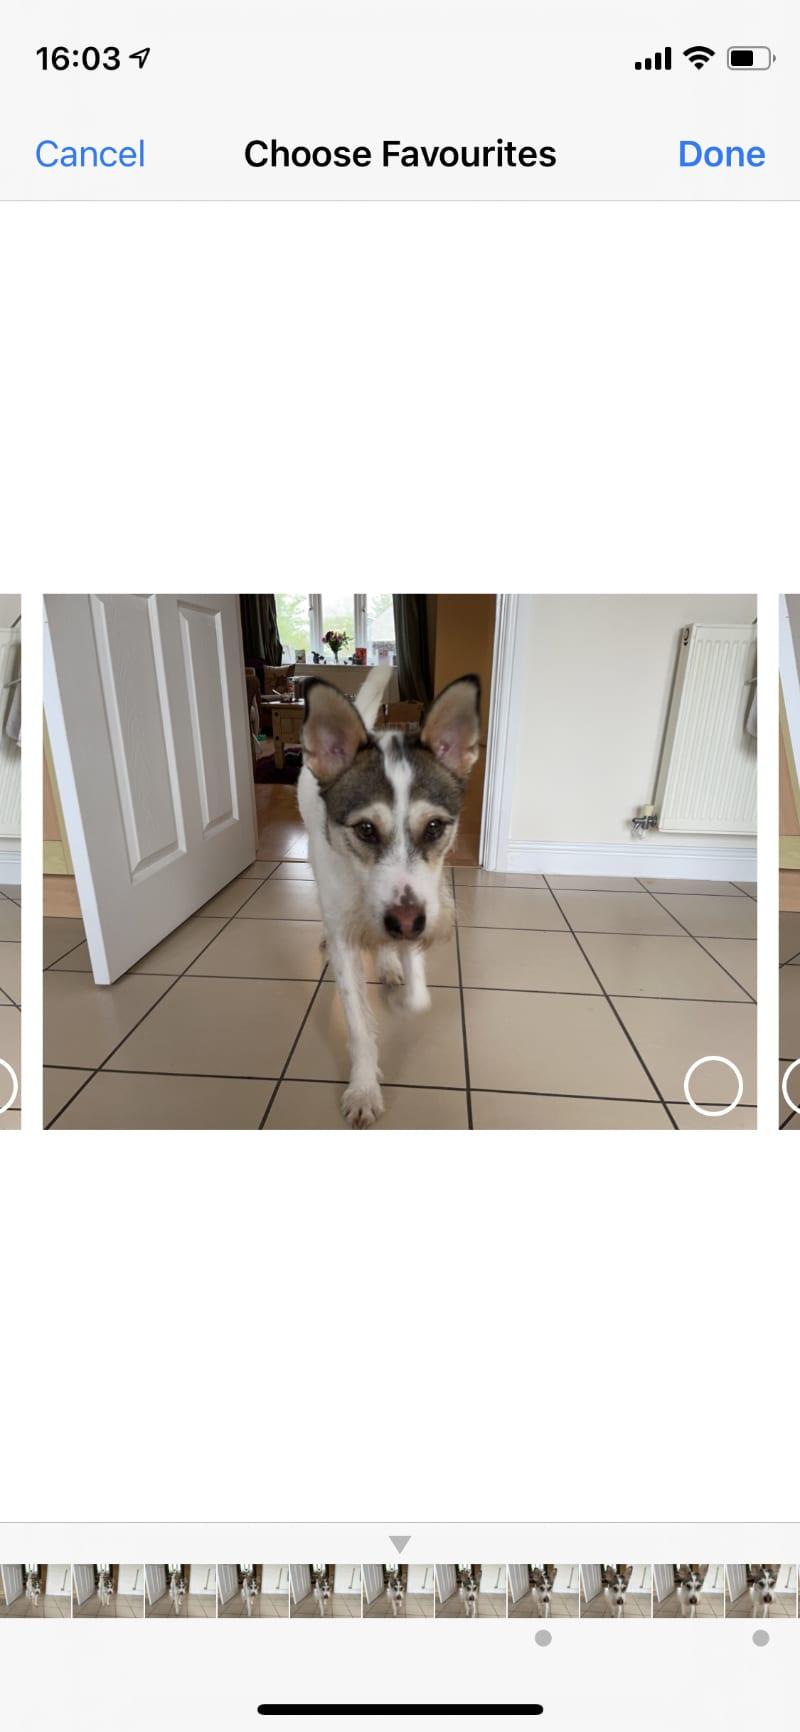 Selecting favorite burst photos on iPhone